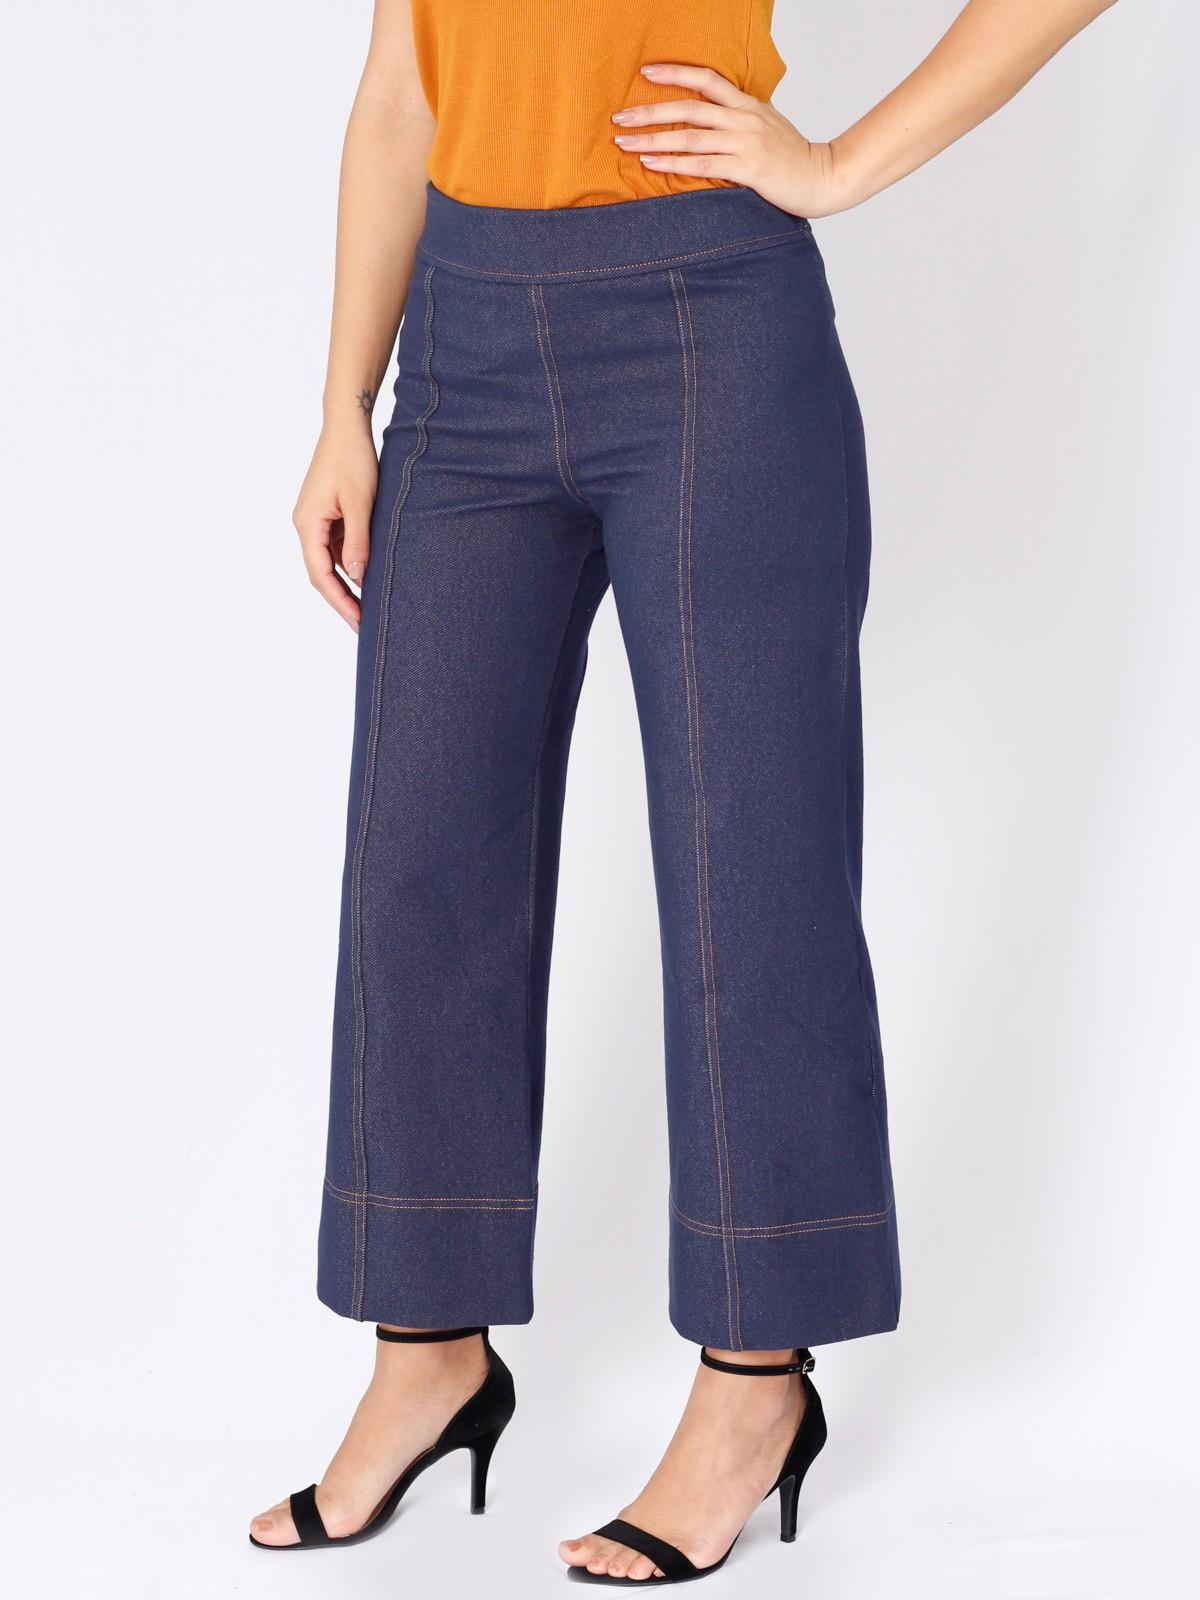 Calça Pantacourt Jeans Malha